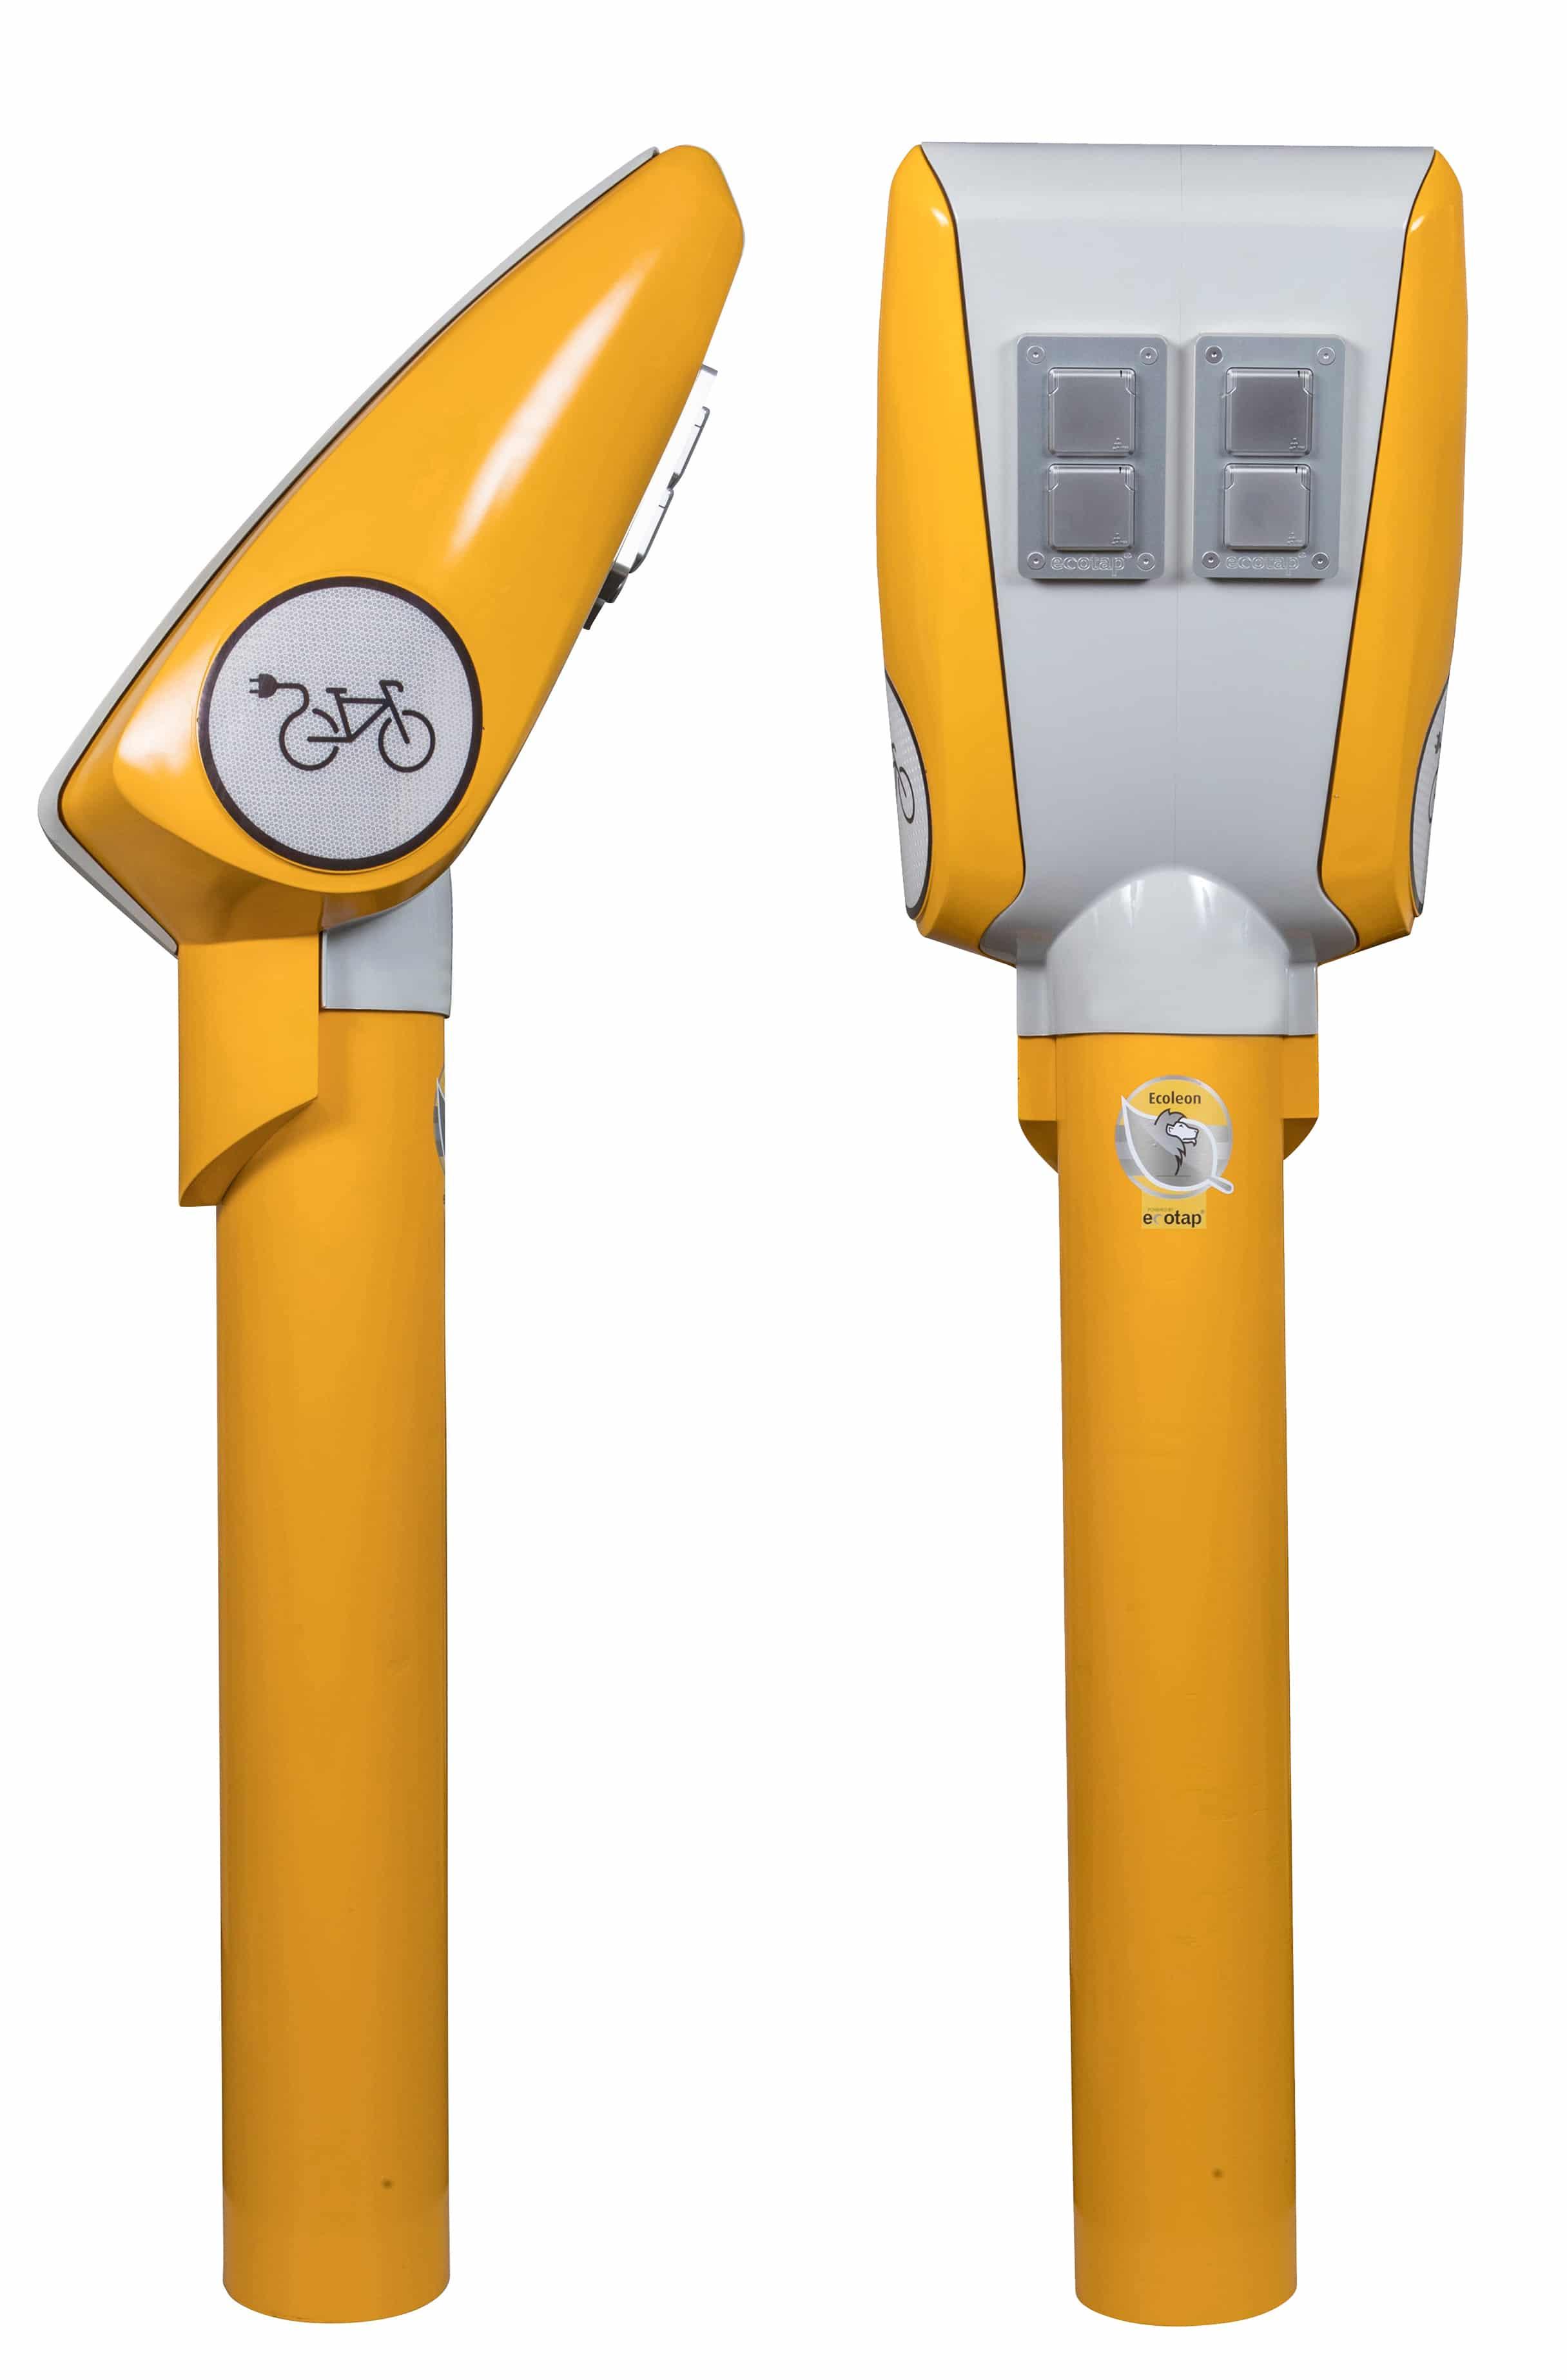 fietslaad-praatpaal